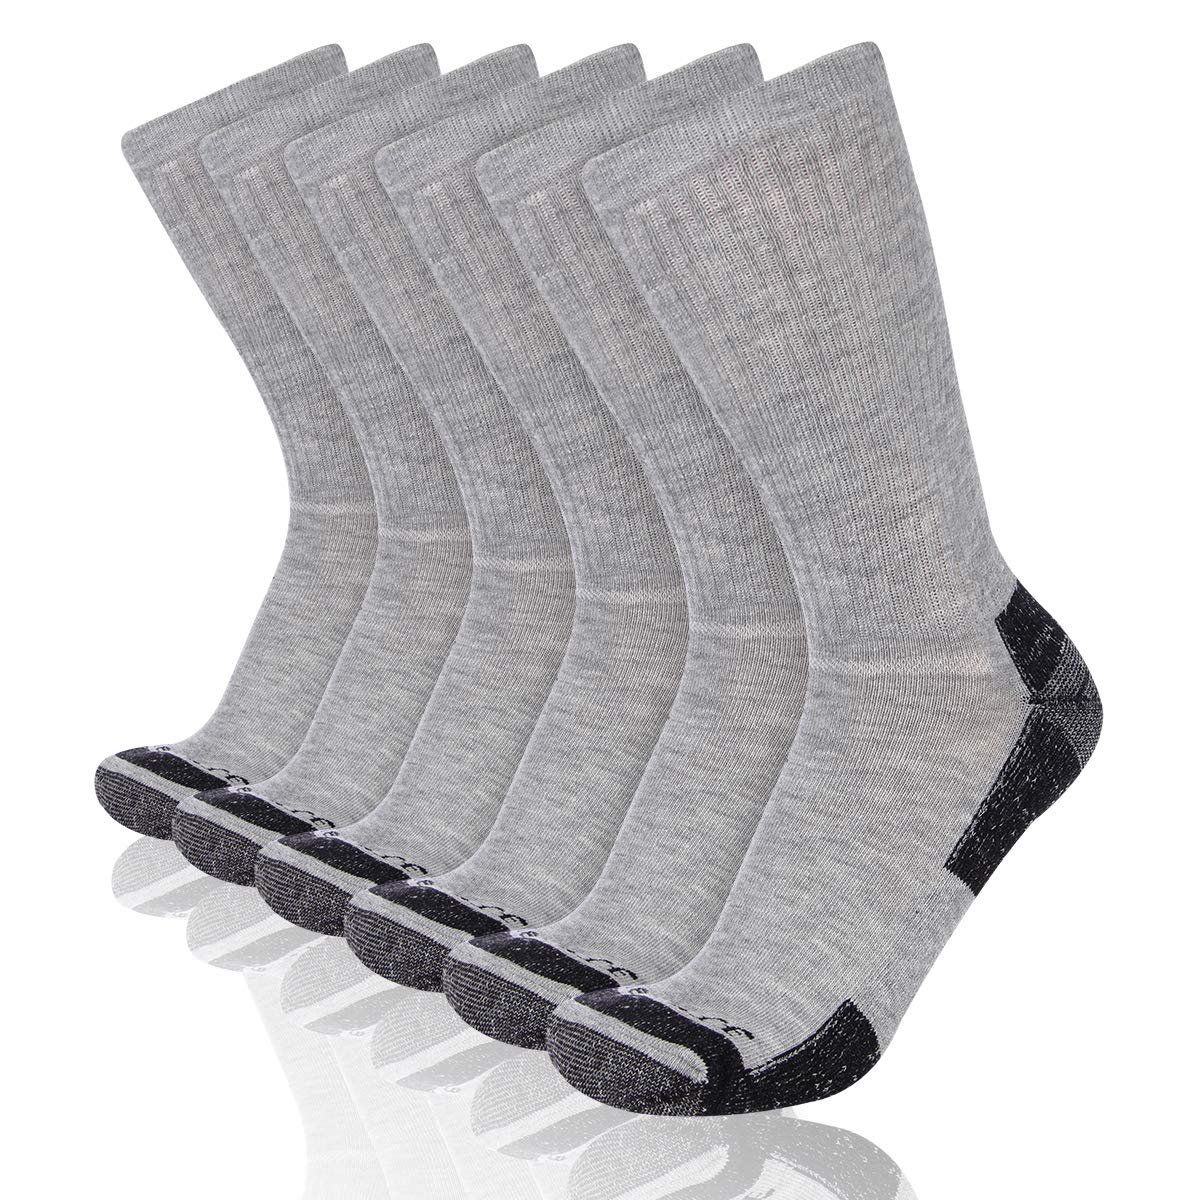 Heatuff Mens 6 Pack Crew Athletic Work Socks With Cushion, Reinforced Heel & Toe For All Seasons